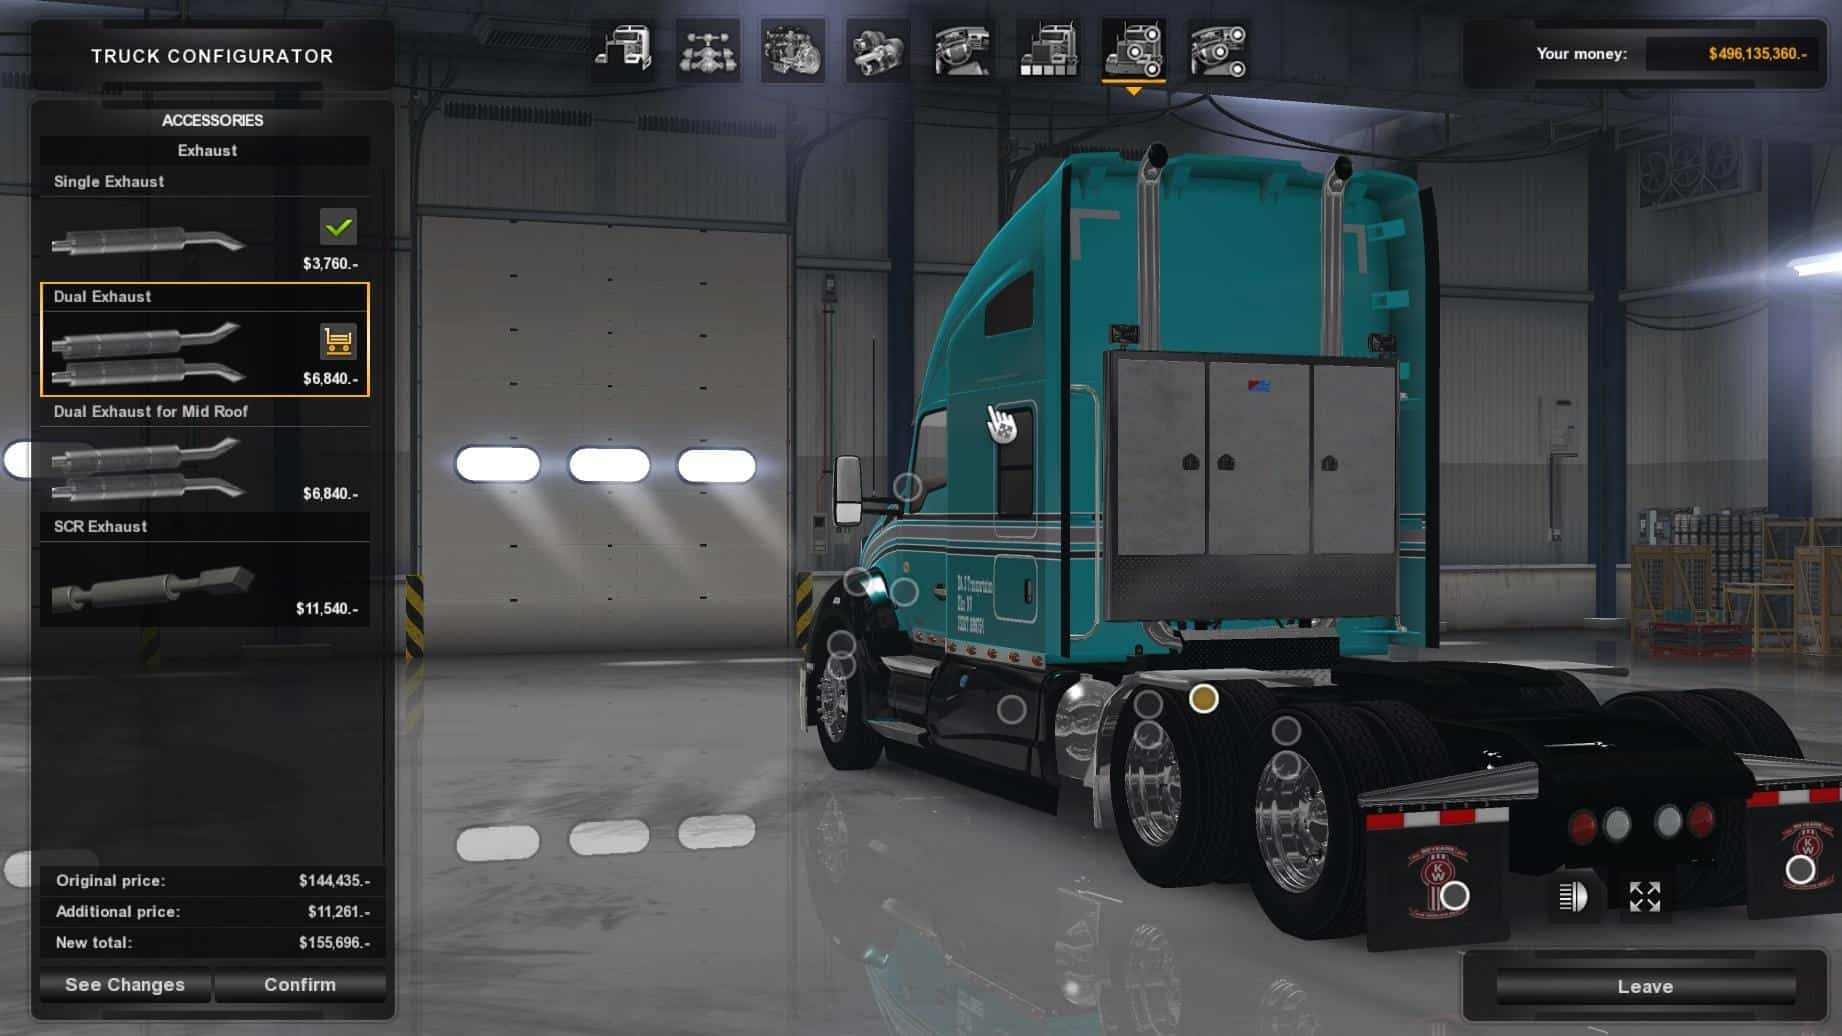 KENWORTH T680 EDIT TRUCK - American Truck Simulator mod | ATS mod